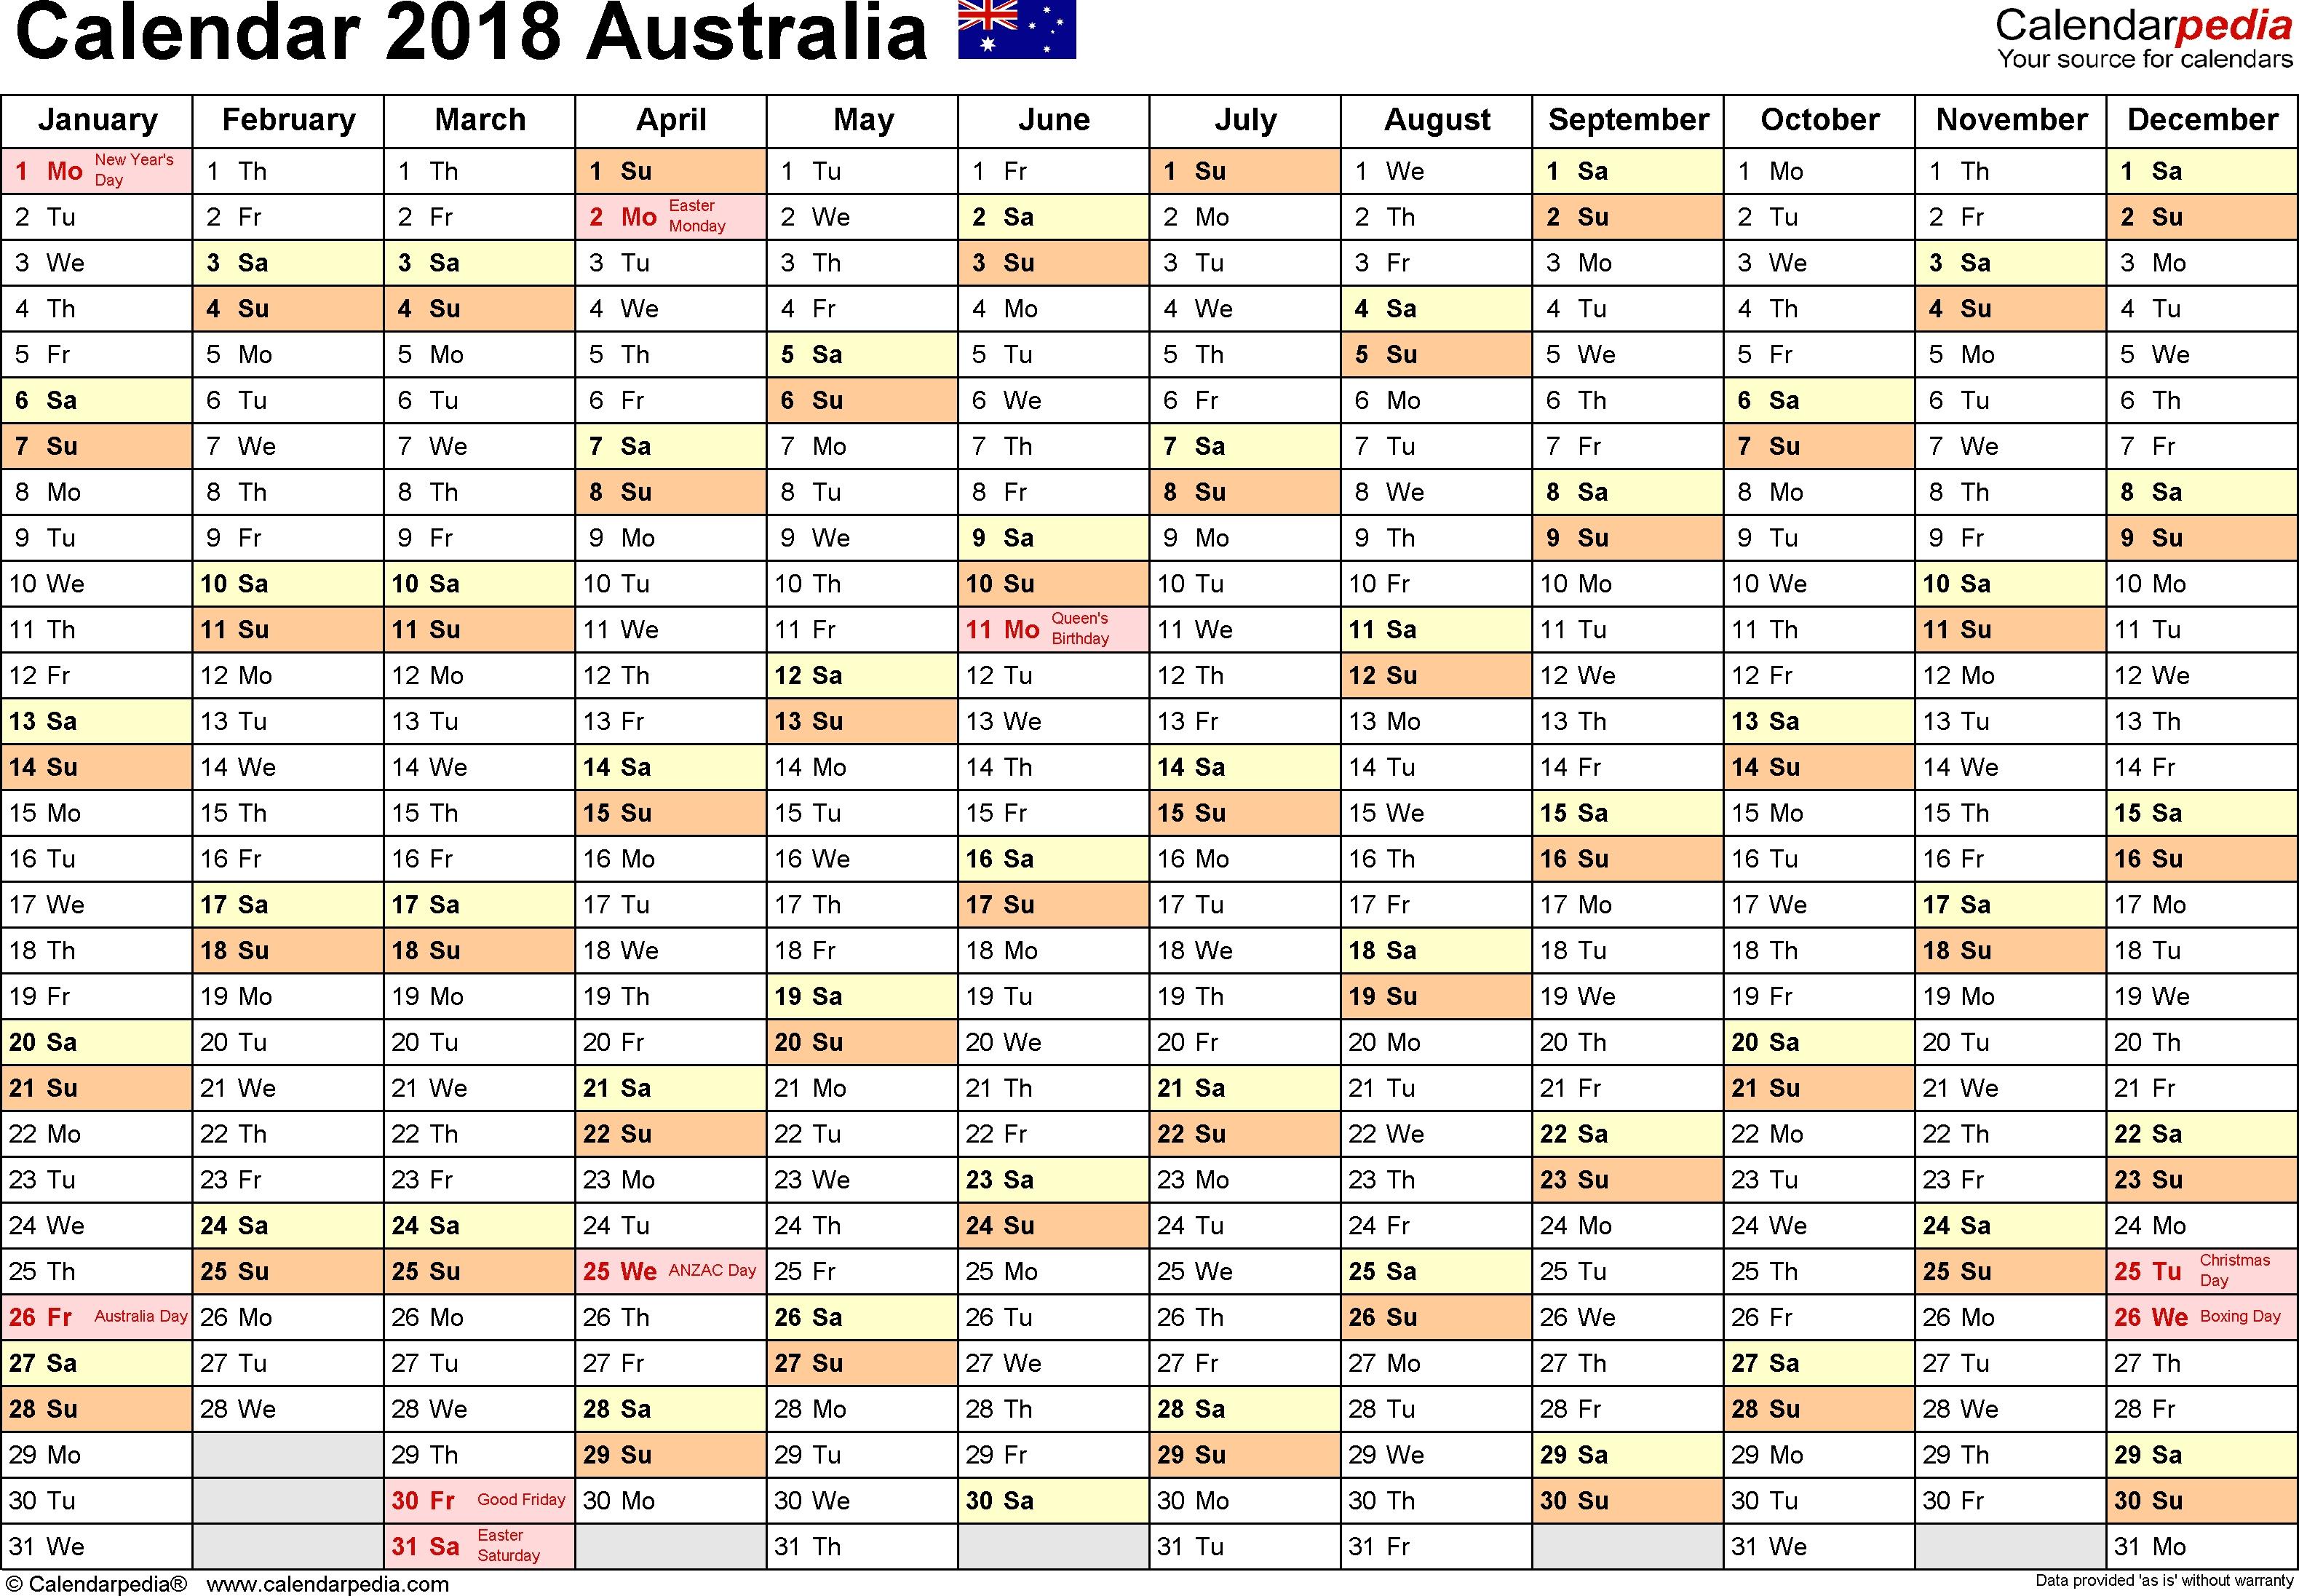 Australia Calendar 2018 - Free Printable Excel Templates  Financial Year Australia Callendar